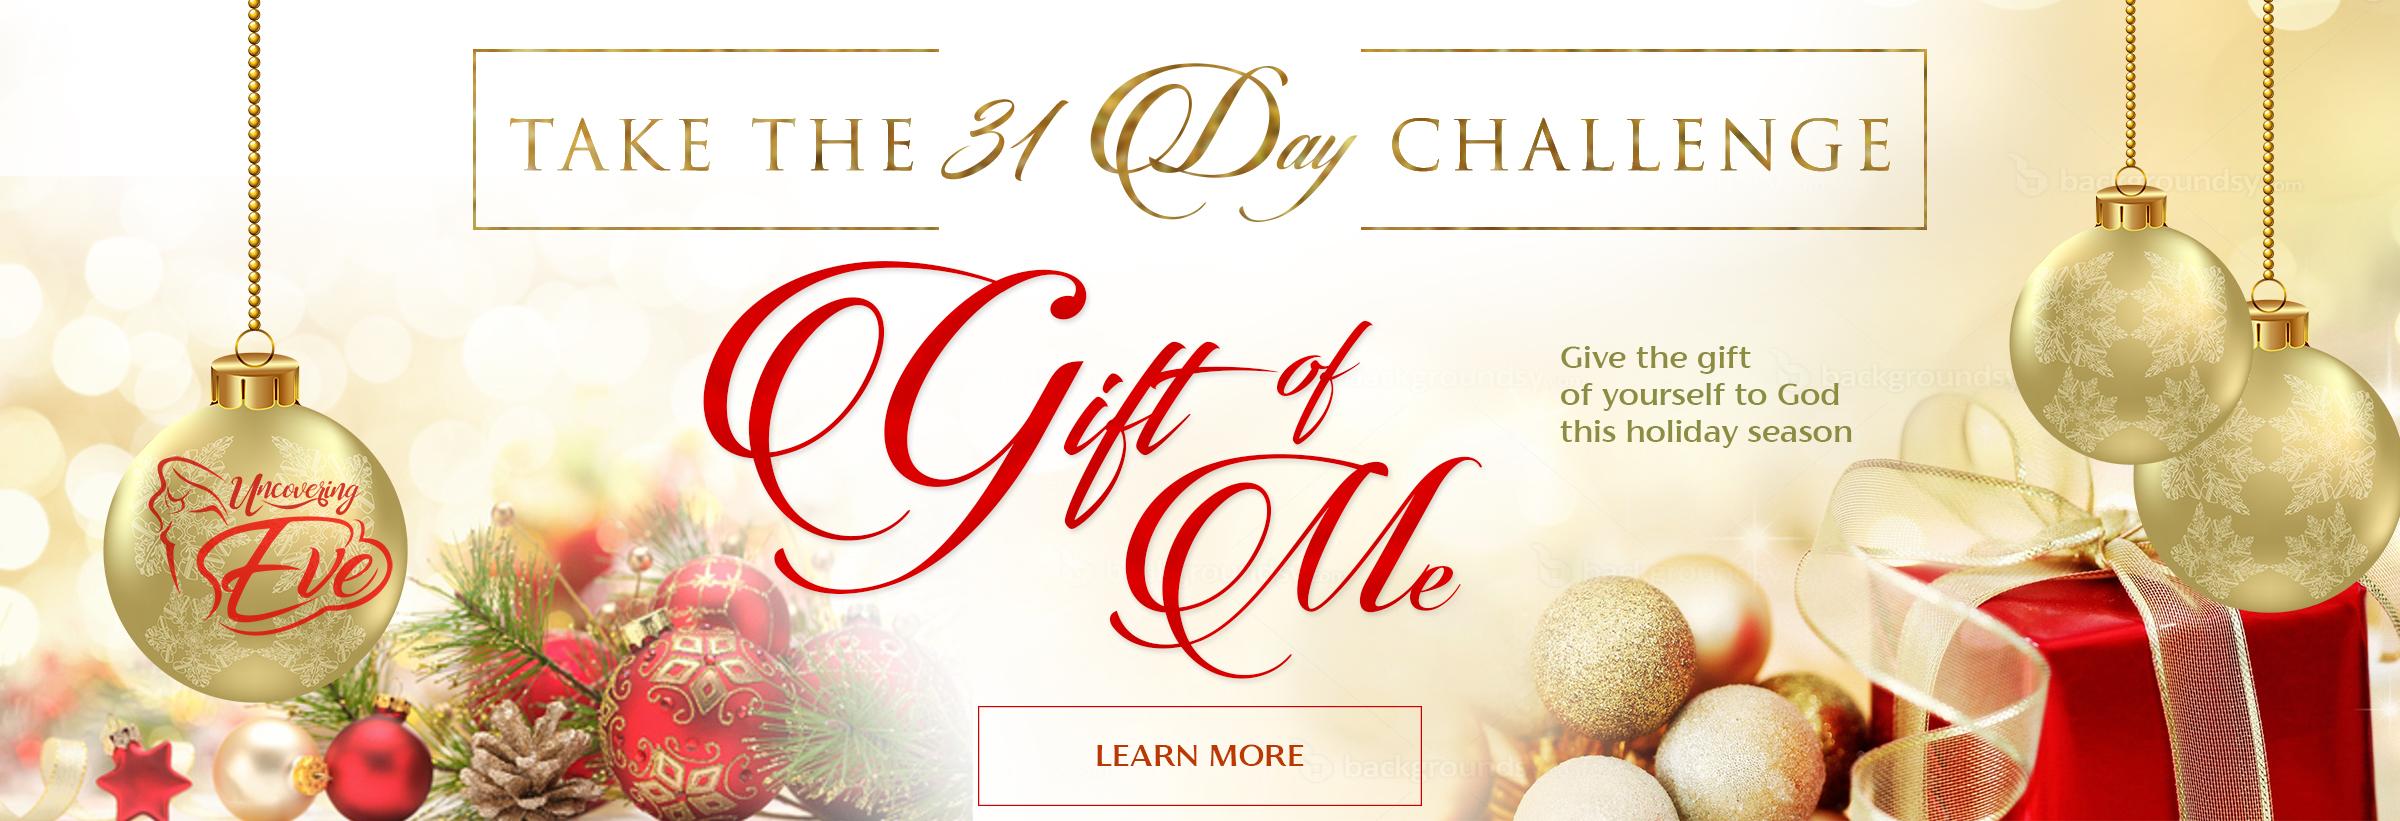 Take the Gift of Me Challenge